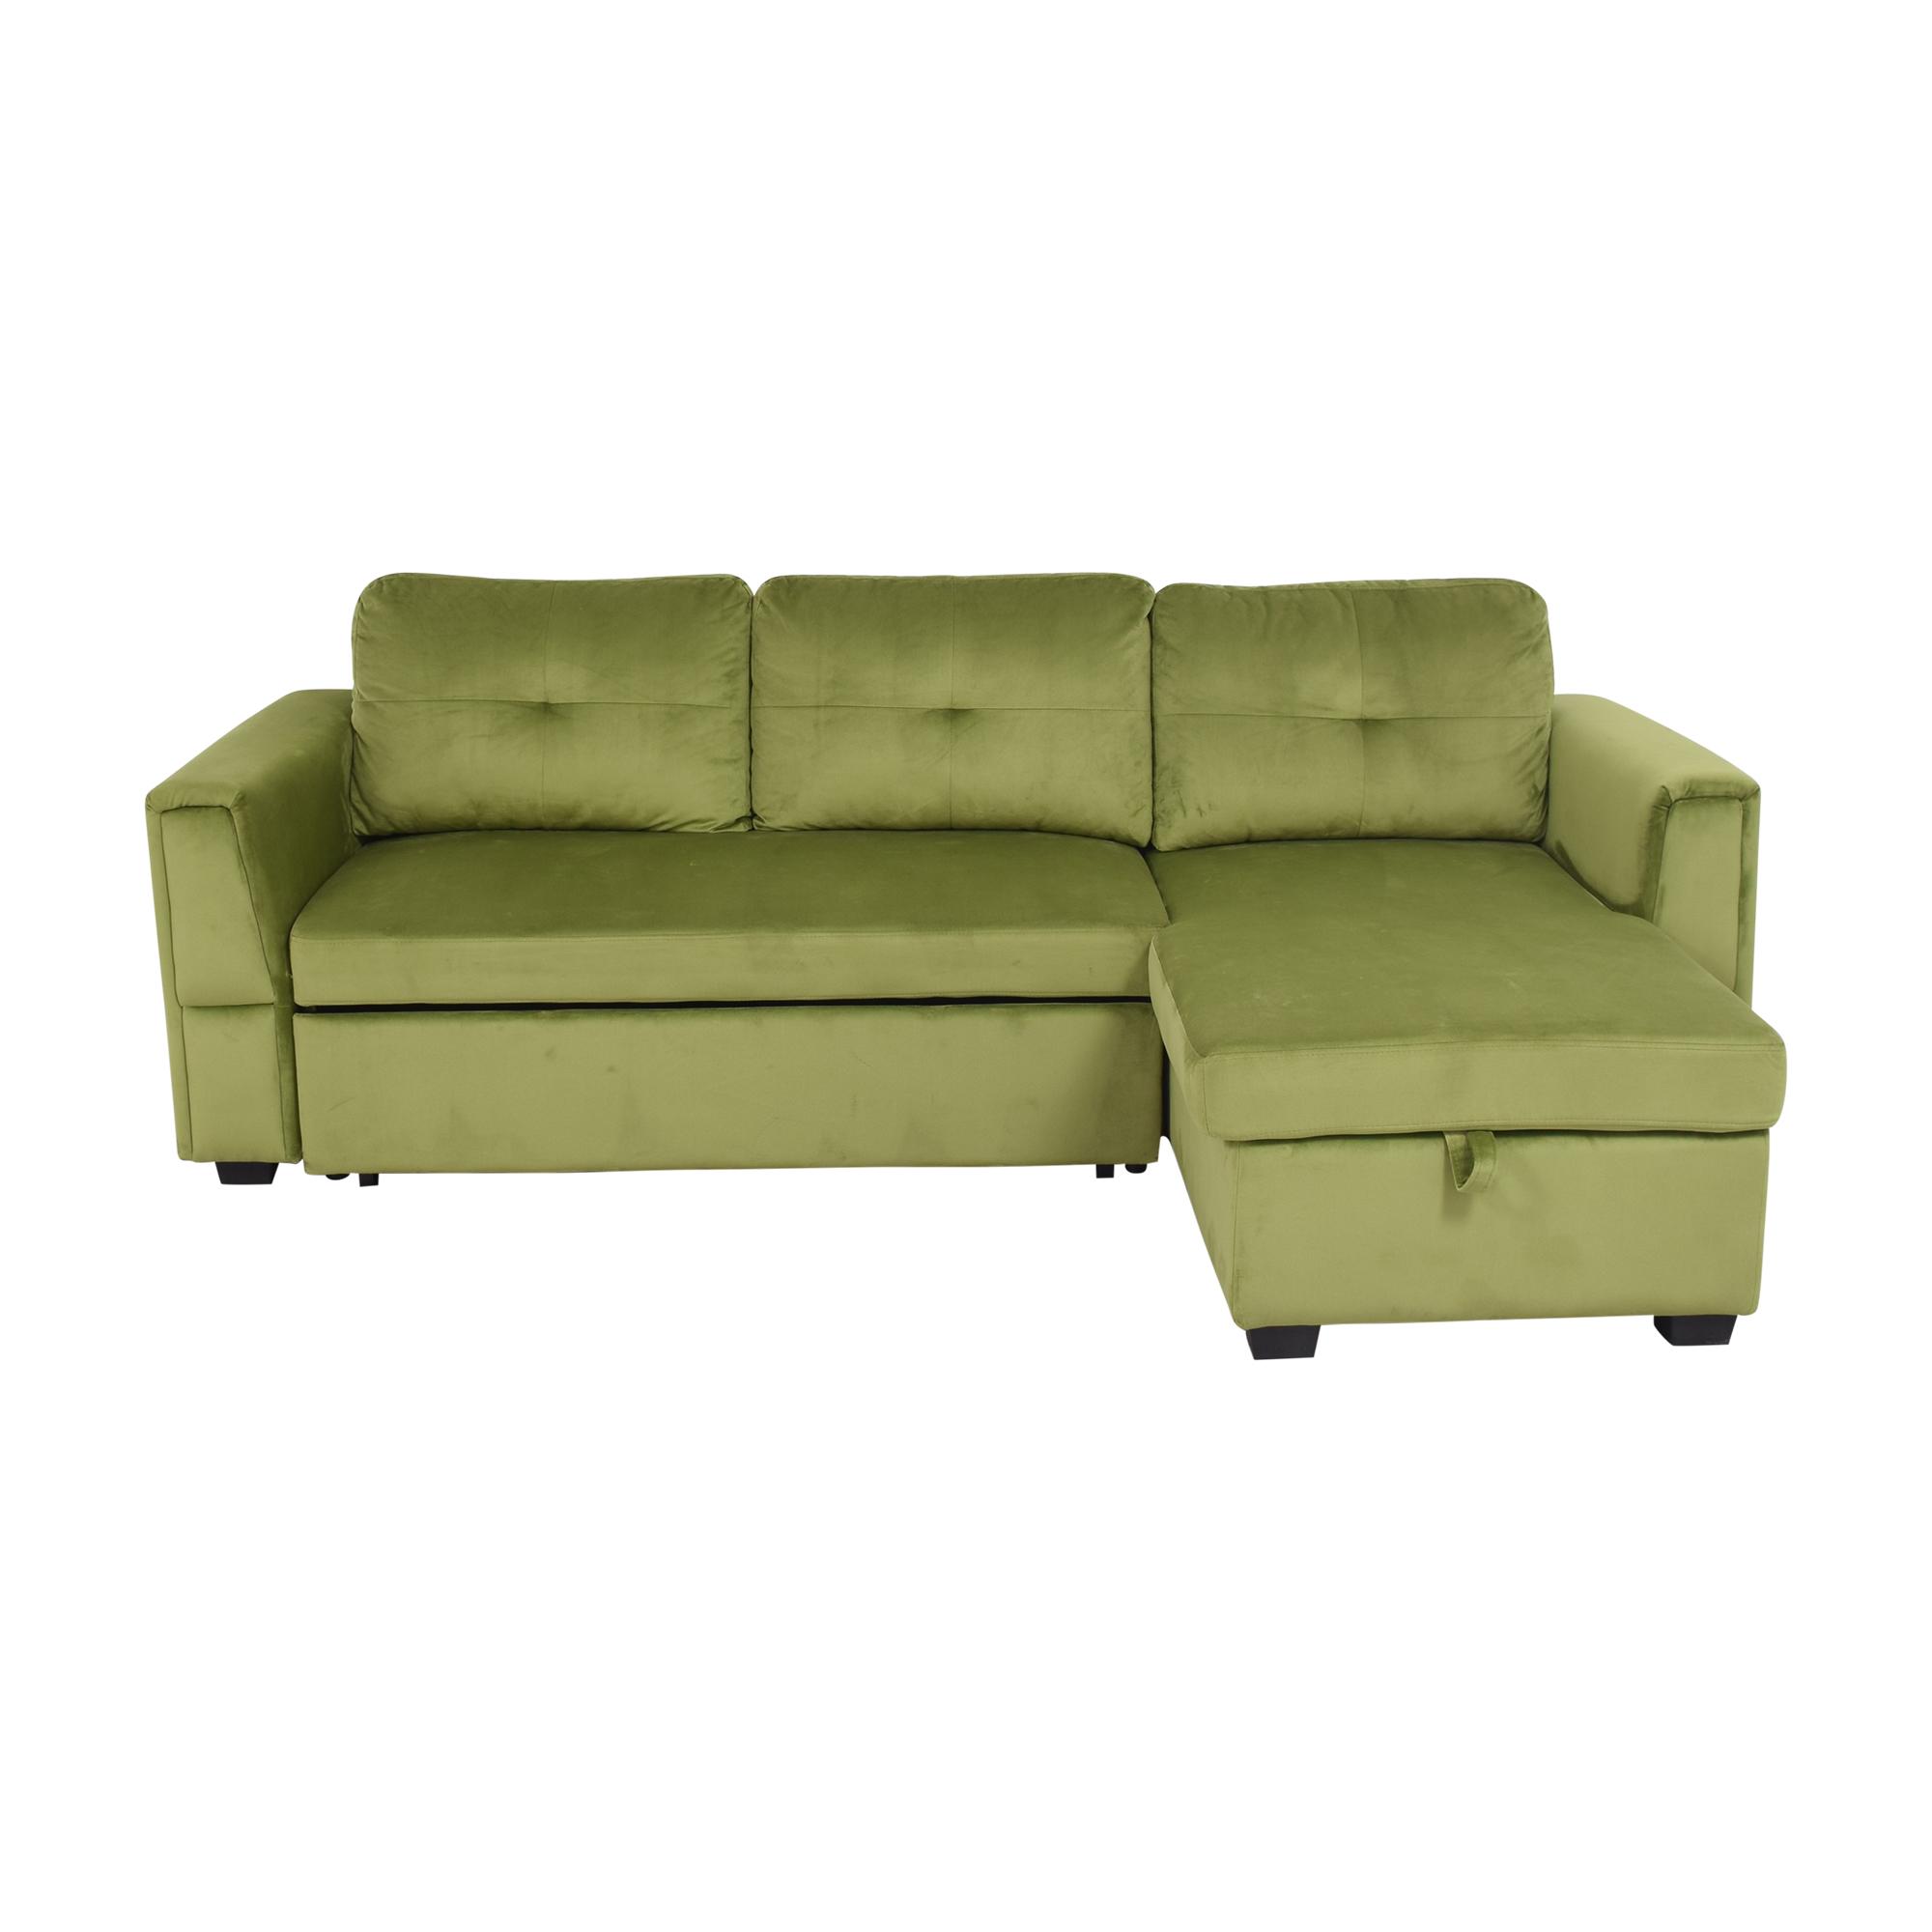 Wayfair Wayfair Mercer41 Nelda Round Arm Sleeper Sofa price